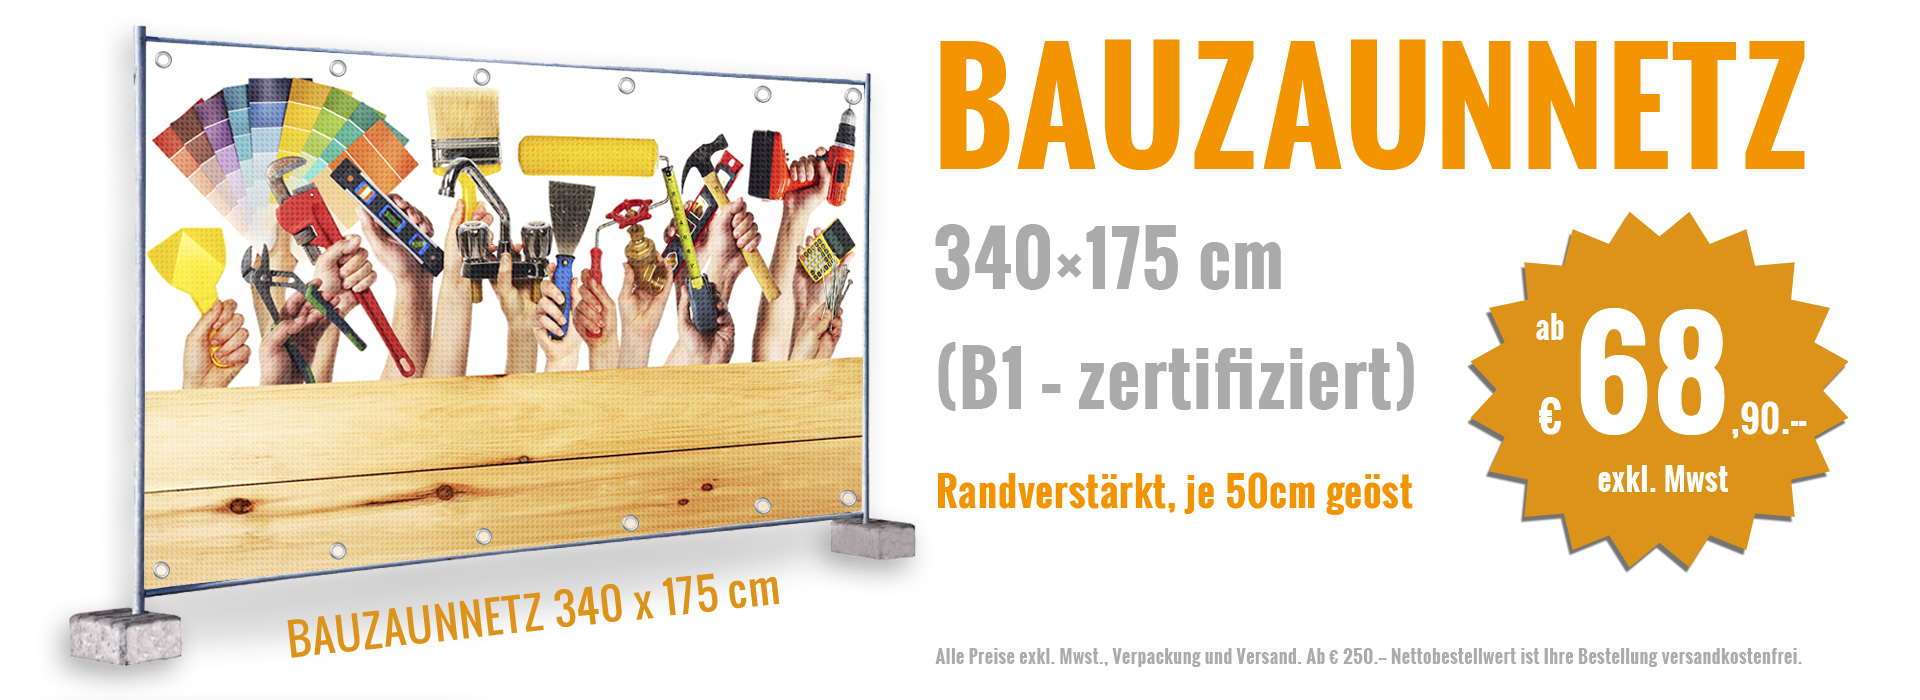 bauzaunnetz-aktion1